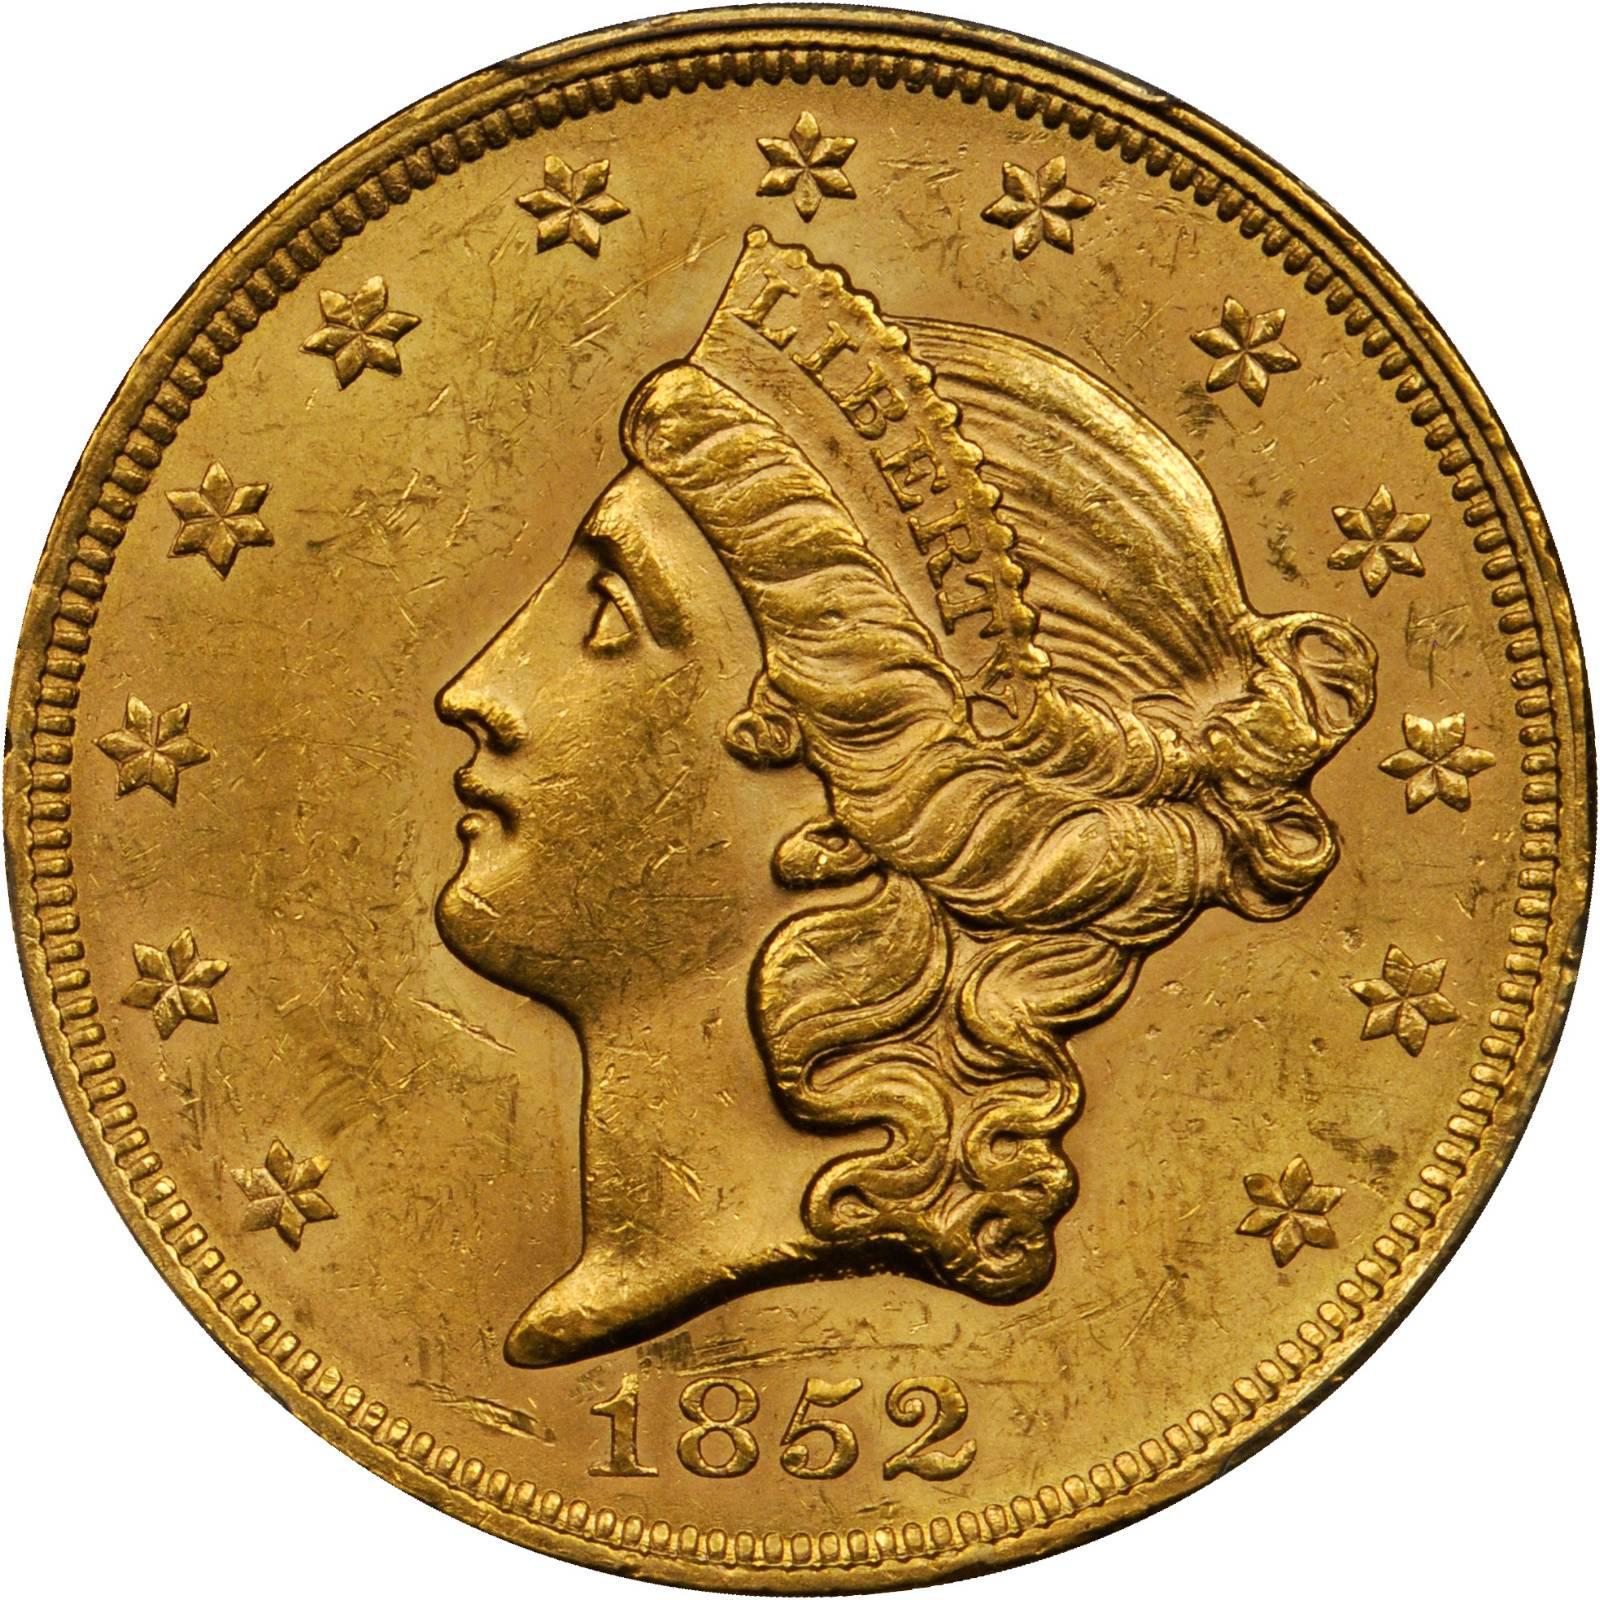 coin worth